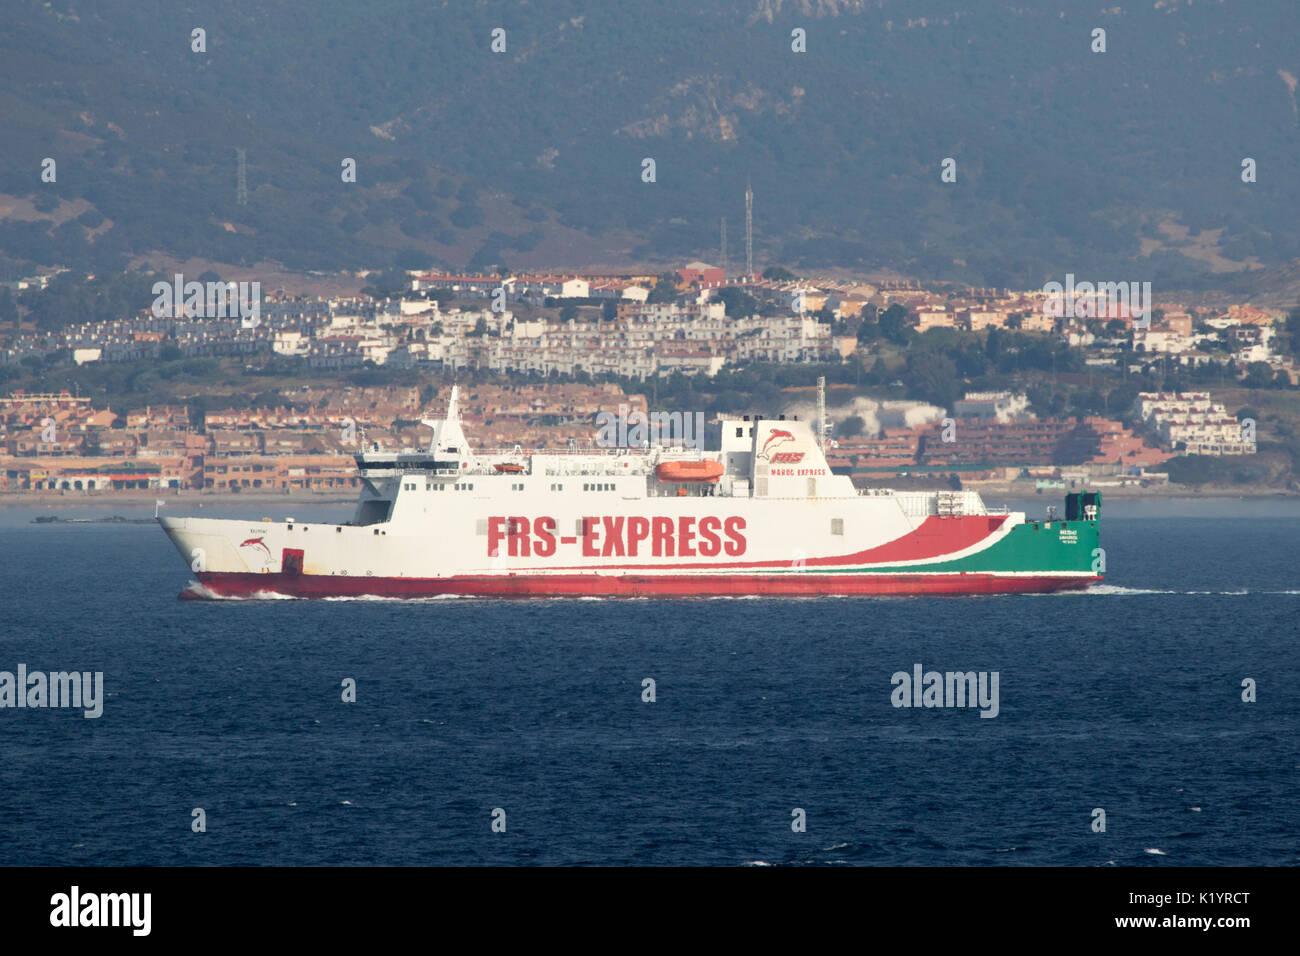 FRS Iberia Maroc Express Kattegat ferry in Gibraltar with heat haze - Stock Image